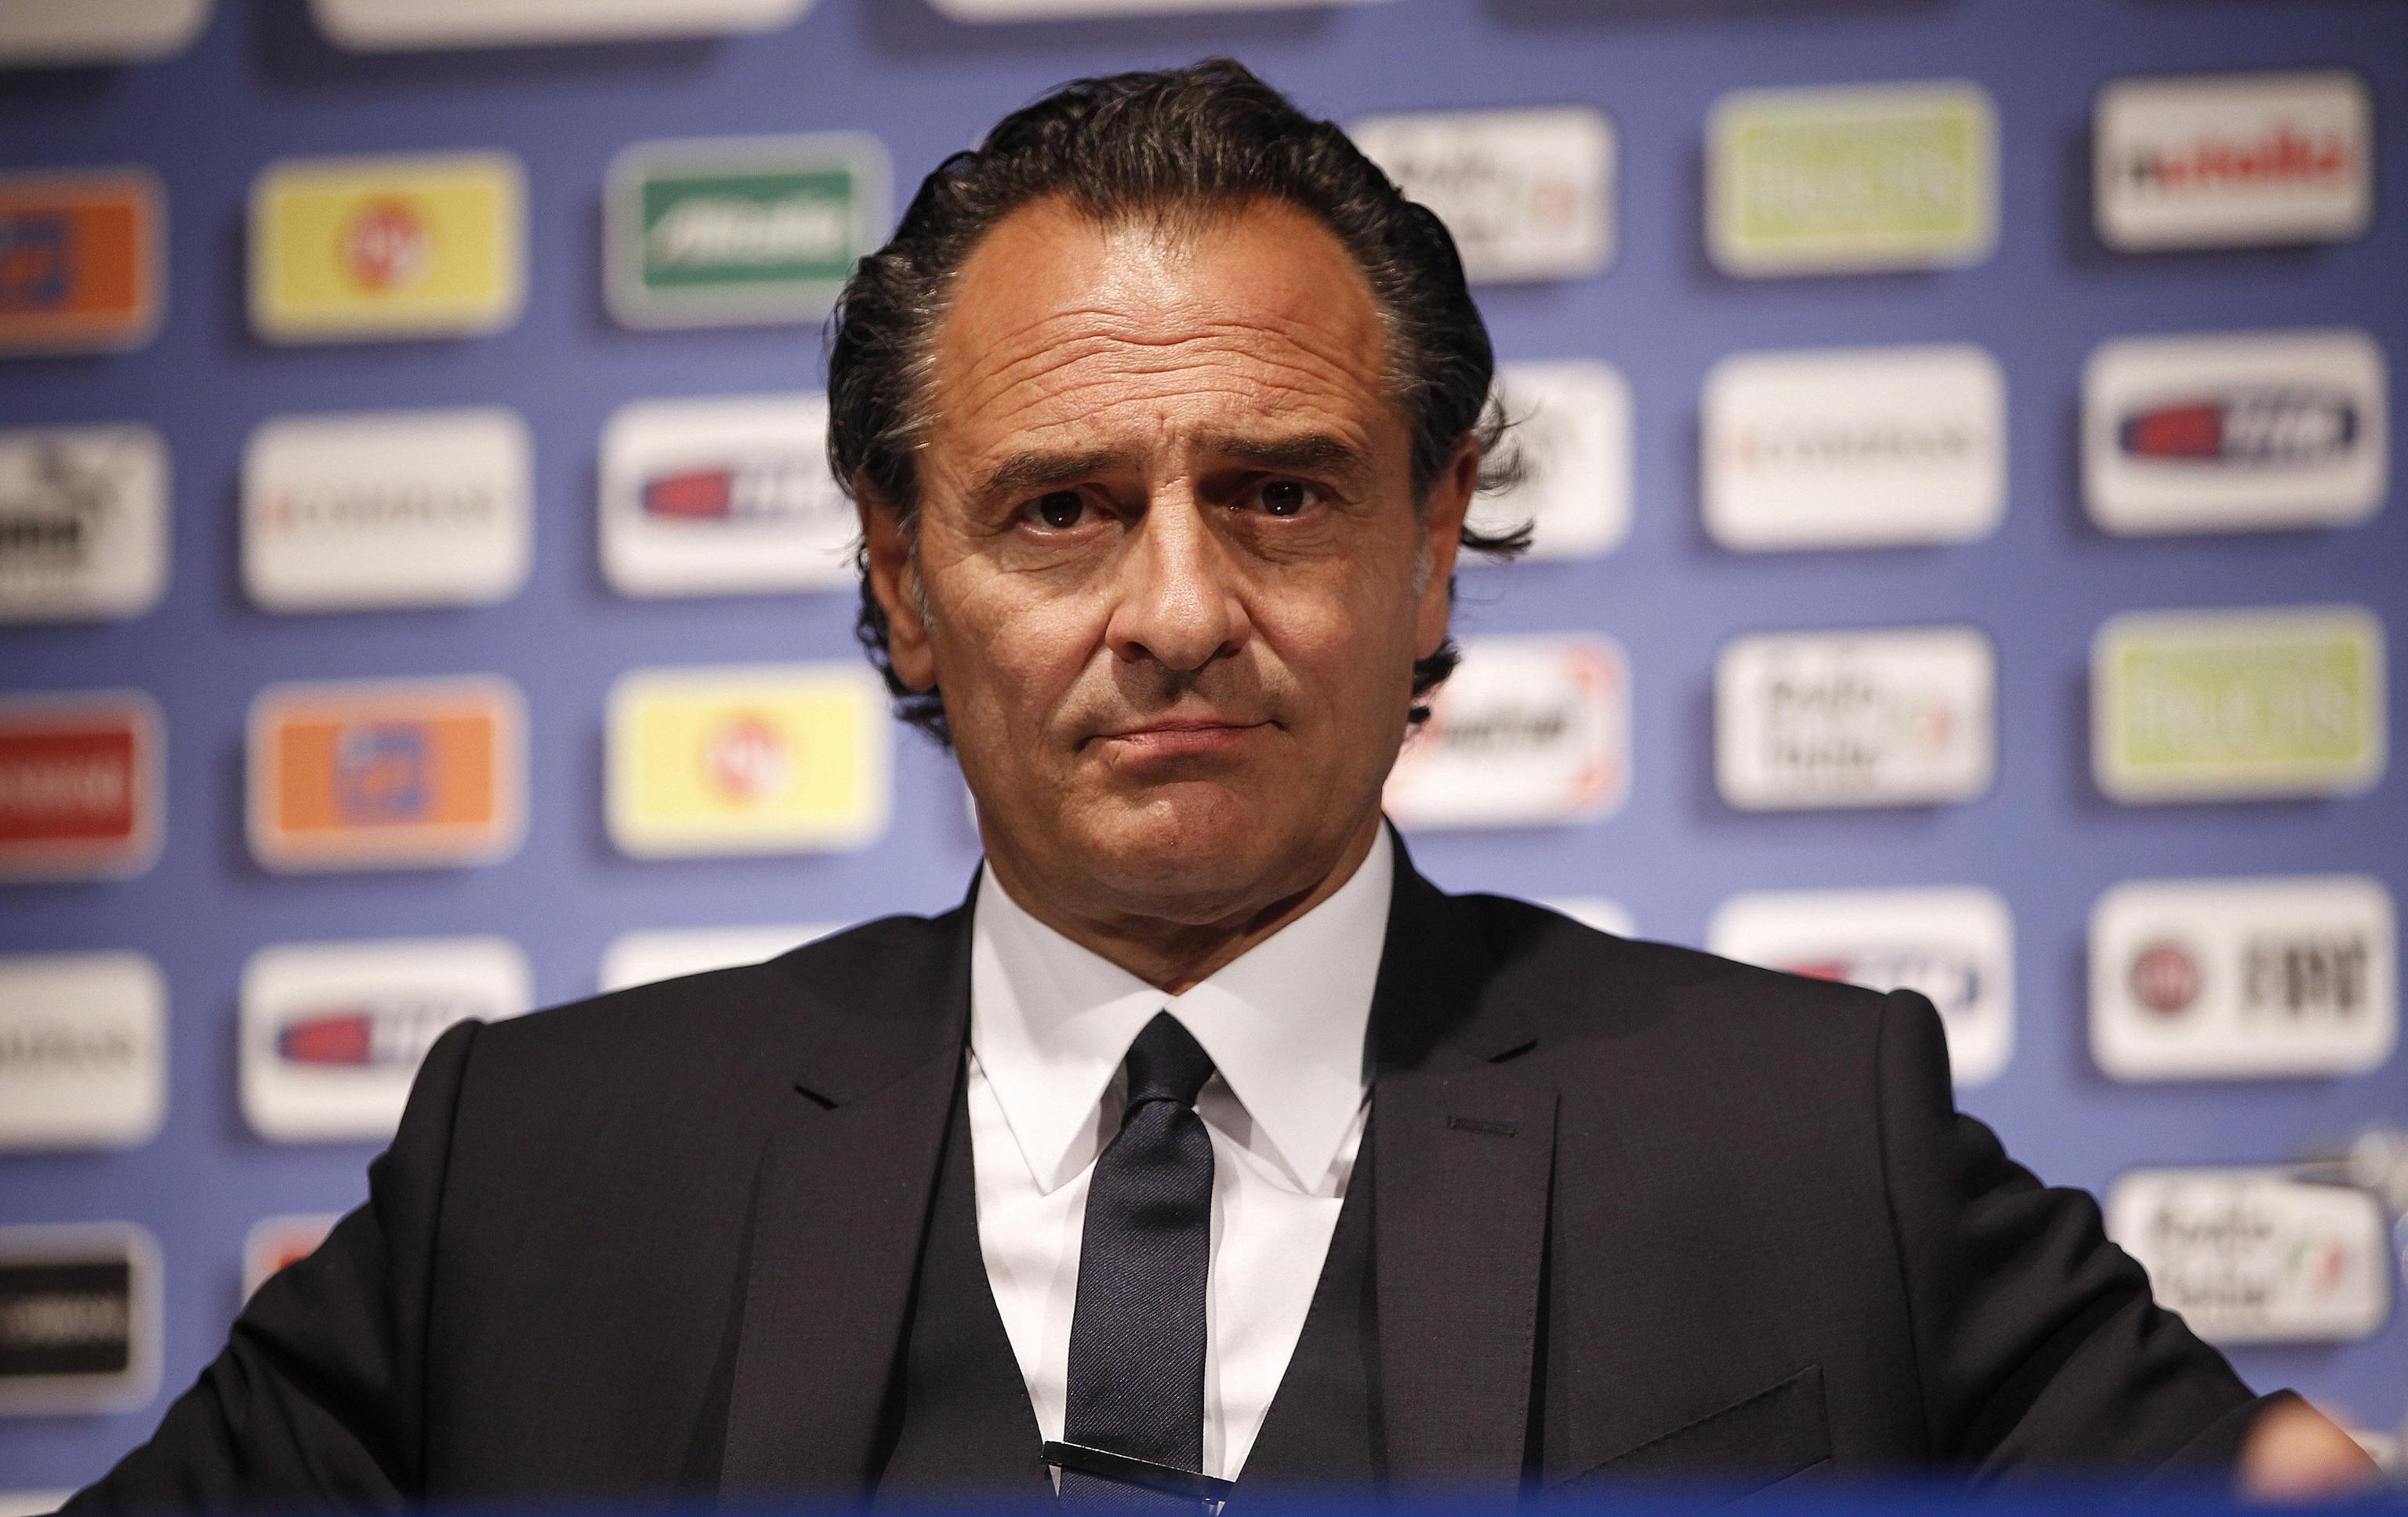 UEFA EURO 2012: ITALY NATIONAL TEAM; CESARE PRANDELLI PRESS CONFERENCE